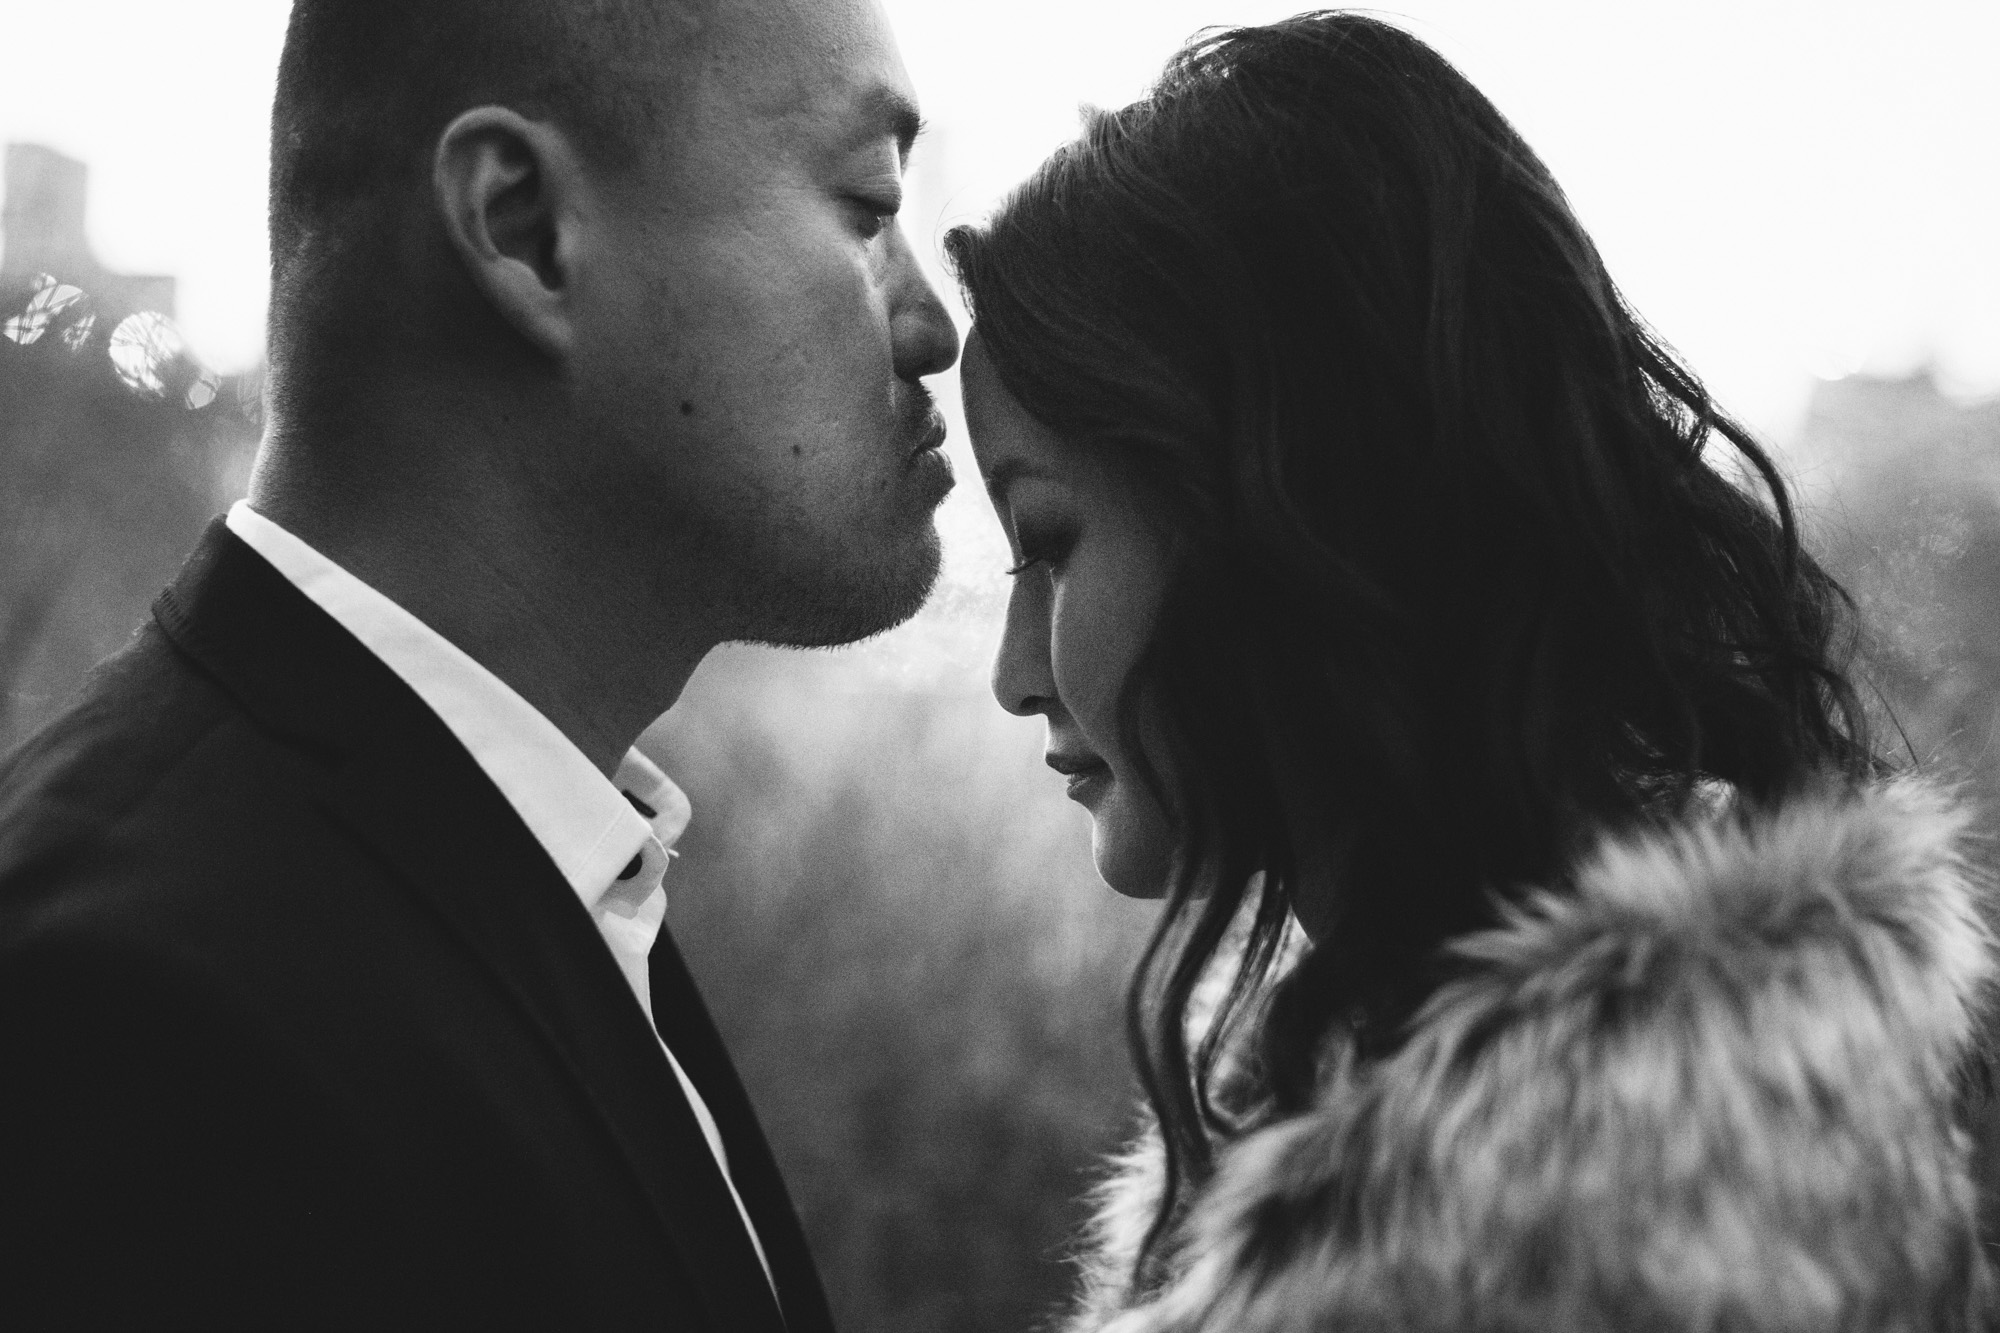 Brooklyn NYC Wedding Photographer Boris Zaretsky DUMBO engagement photography 5X2A7991 copy.jpg